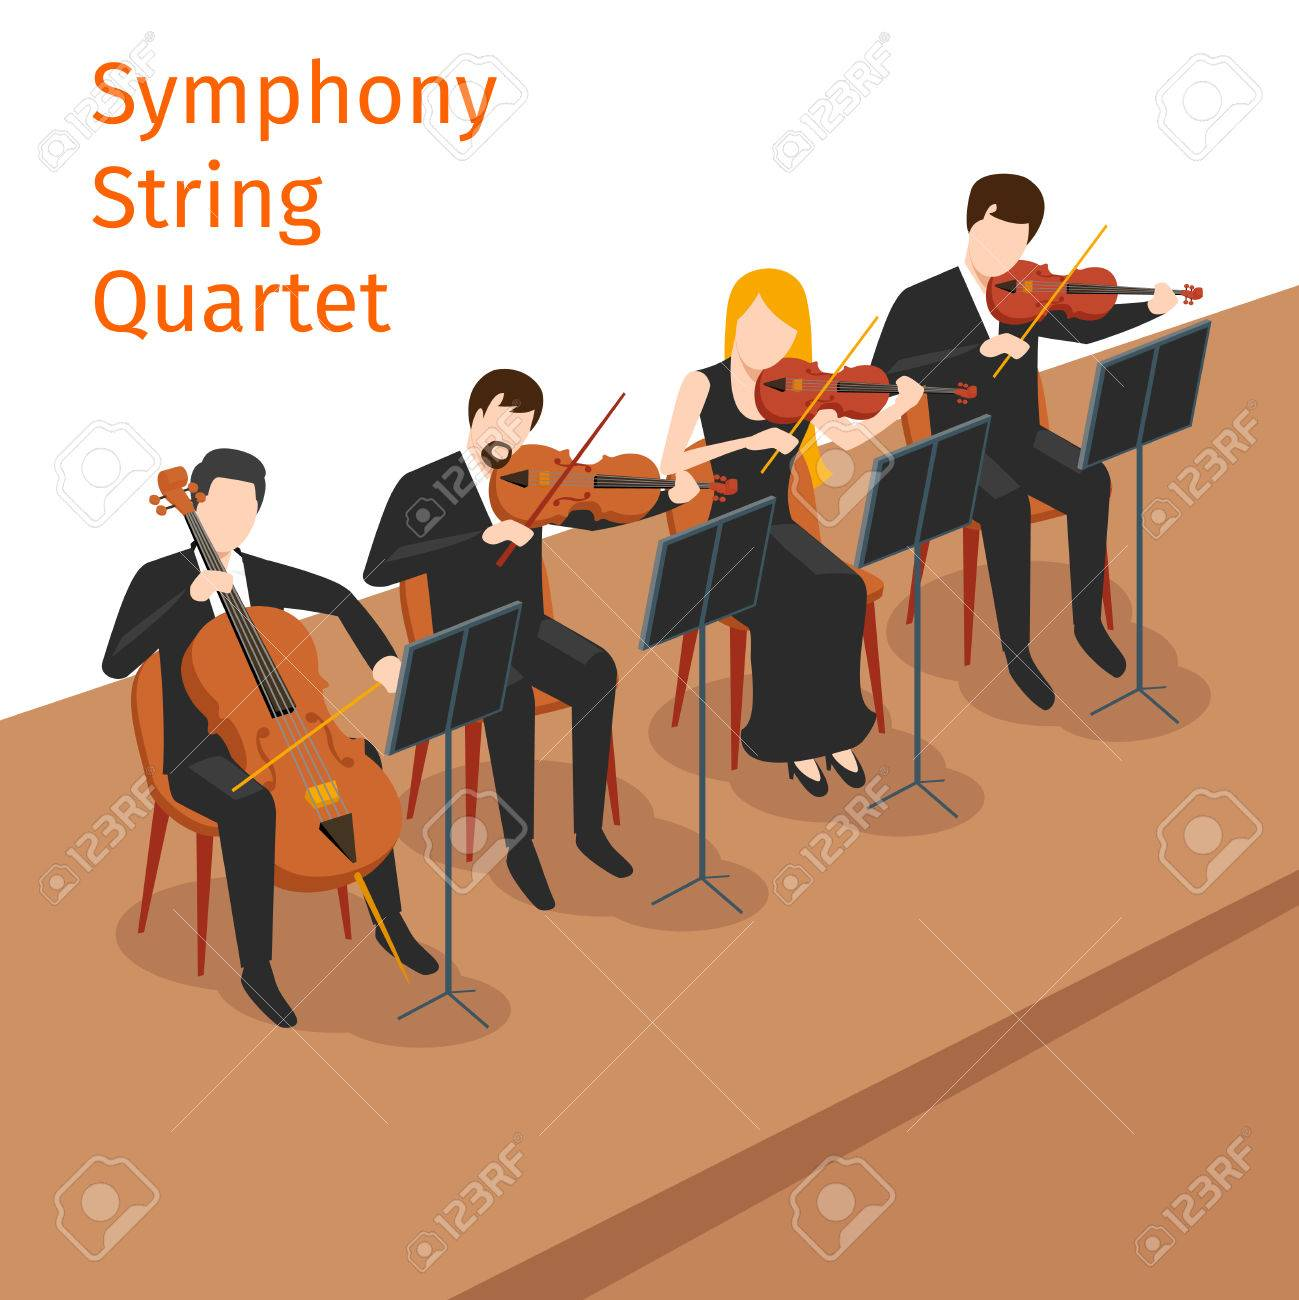 Symphonic orchestra string quartet background concept  Music